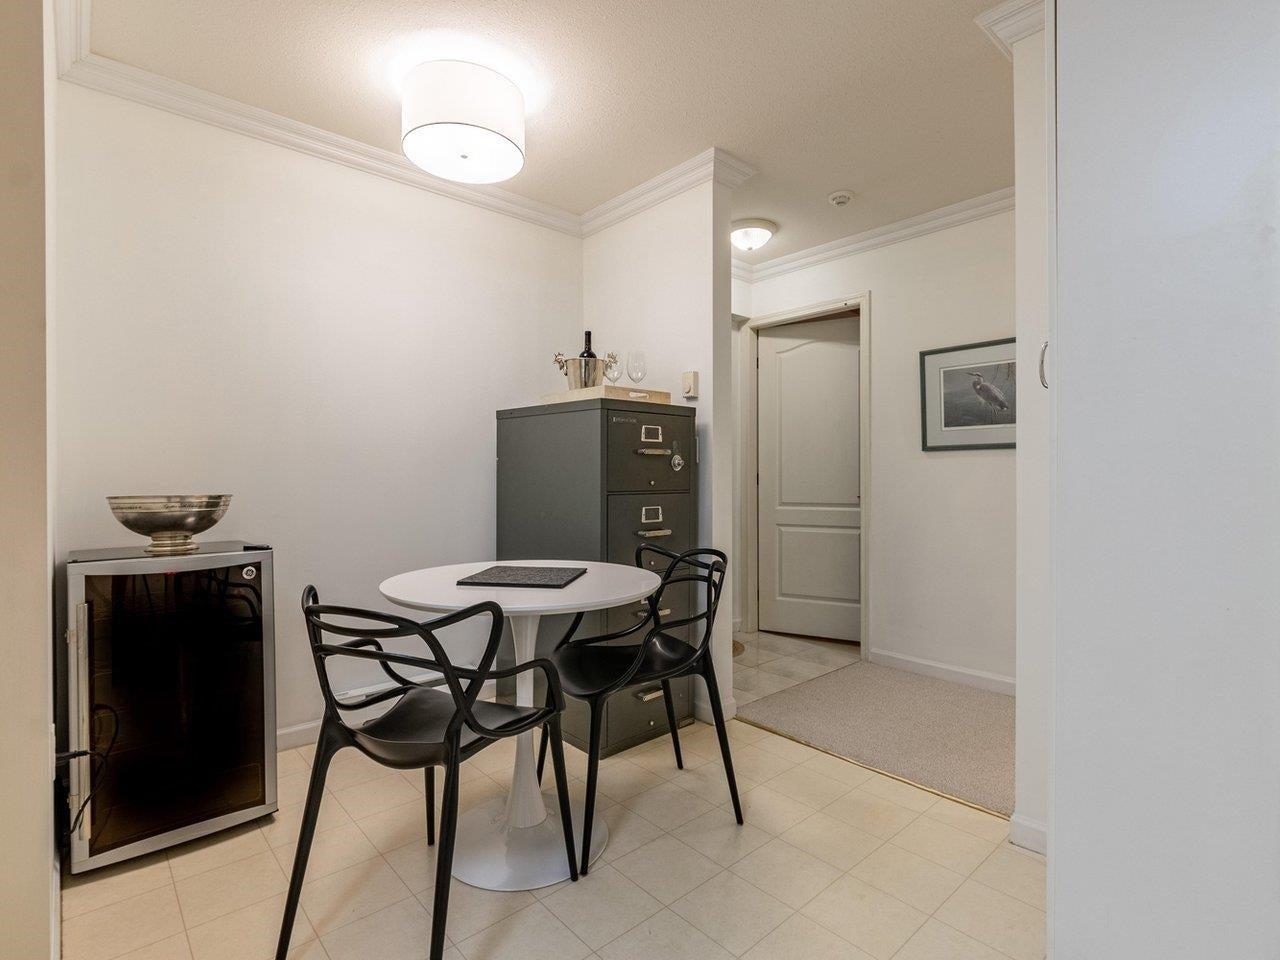 306 15298 20 AVENUE - King George Corridor Apartment/Condo for sale, 2 Bedrooms (R2625551) - #8